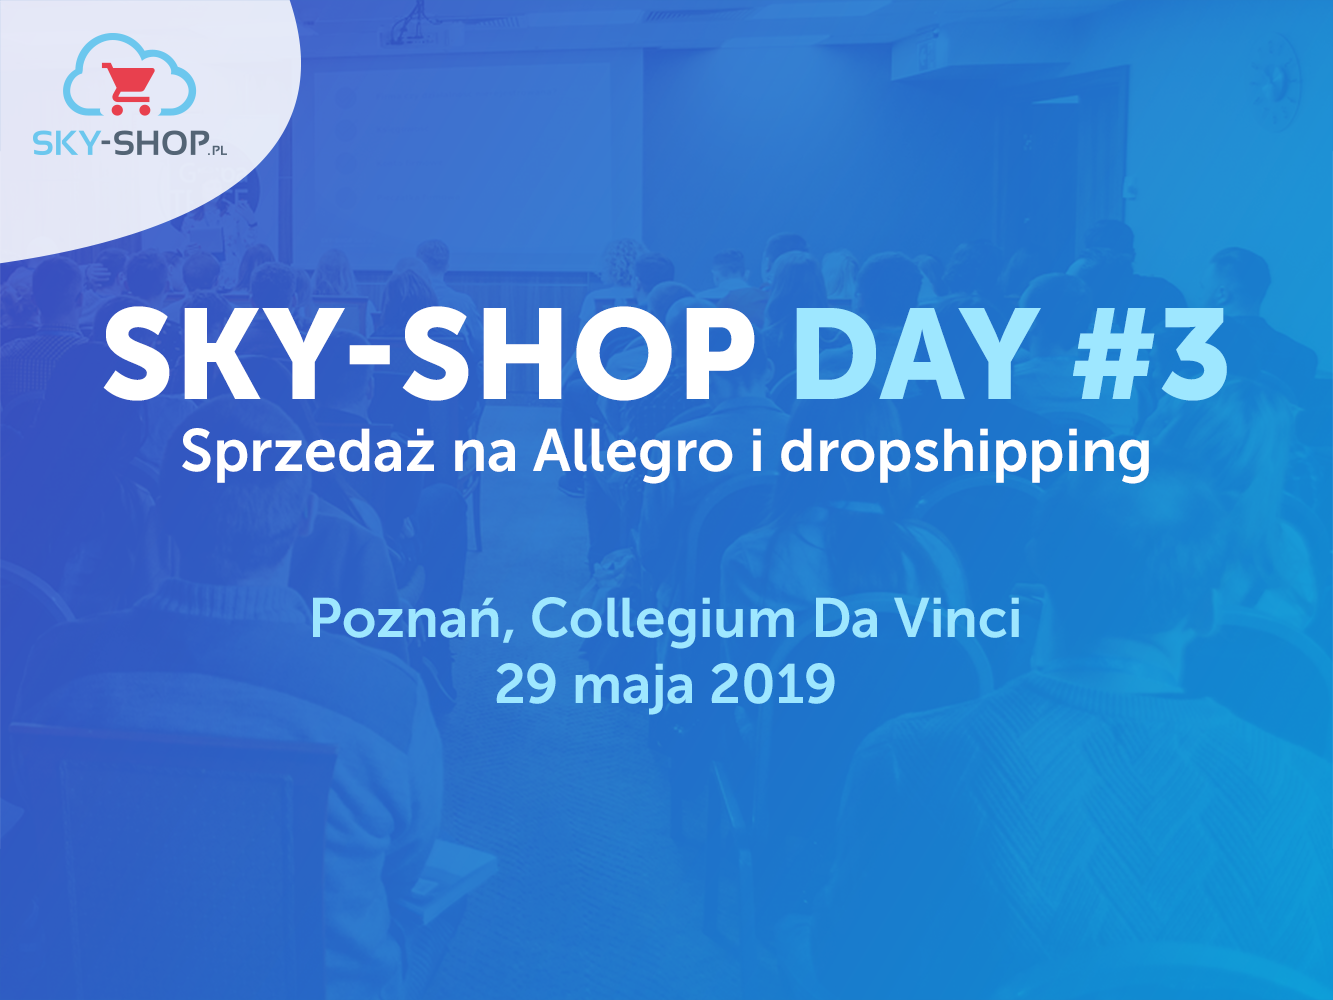 Sky-Shop Day 1